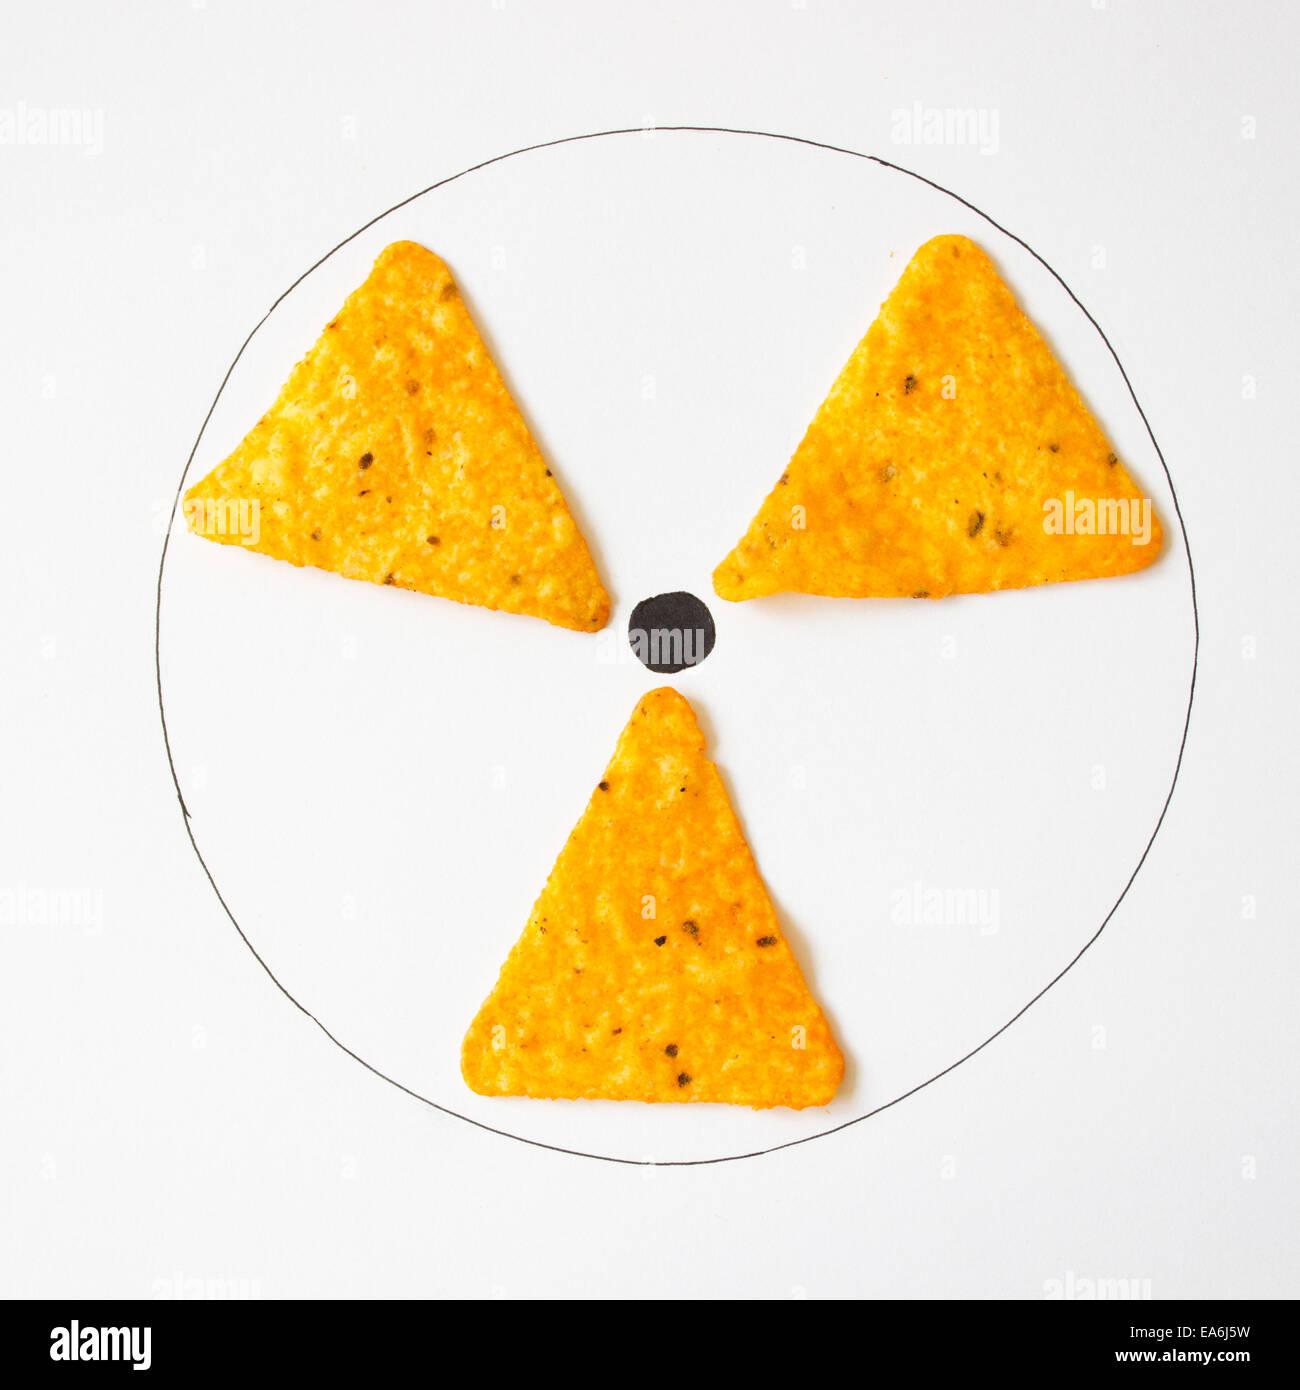 Conceptual radiation symbol - Stock Image